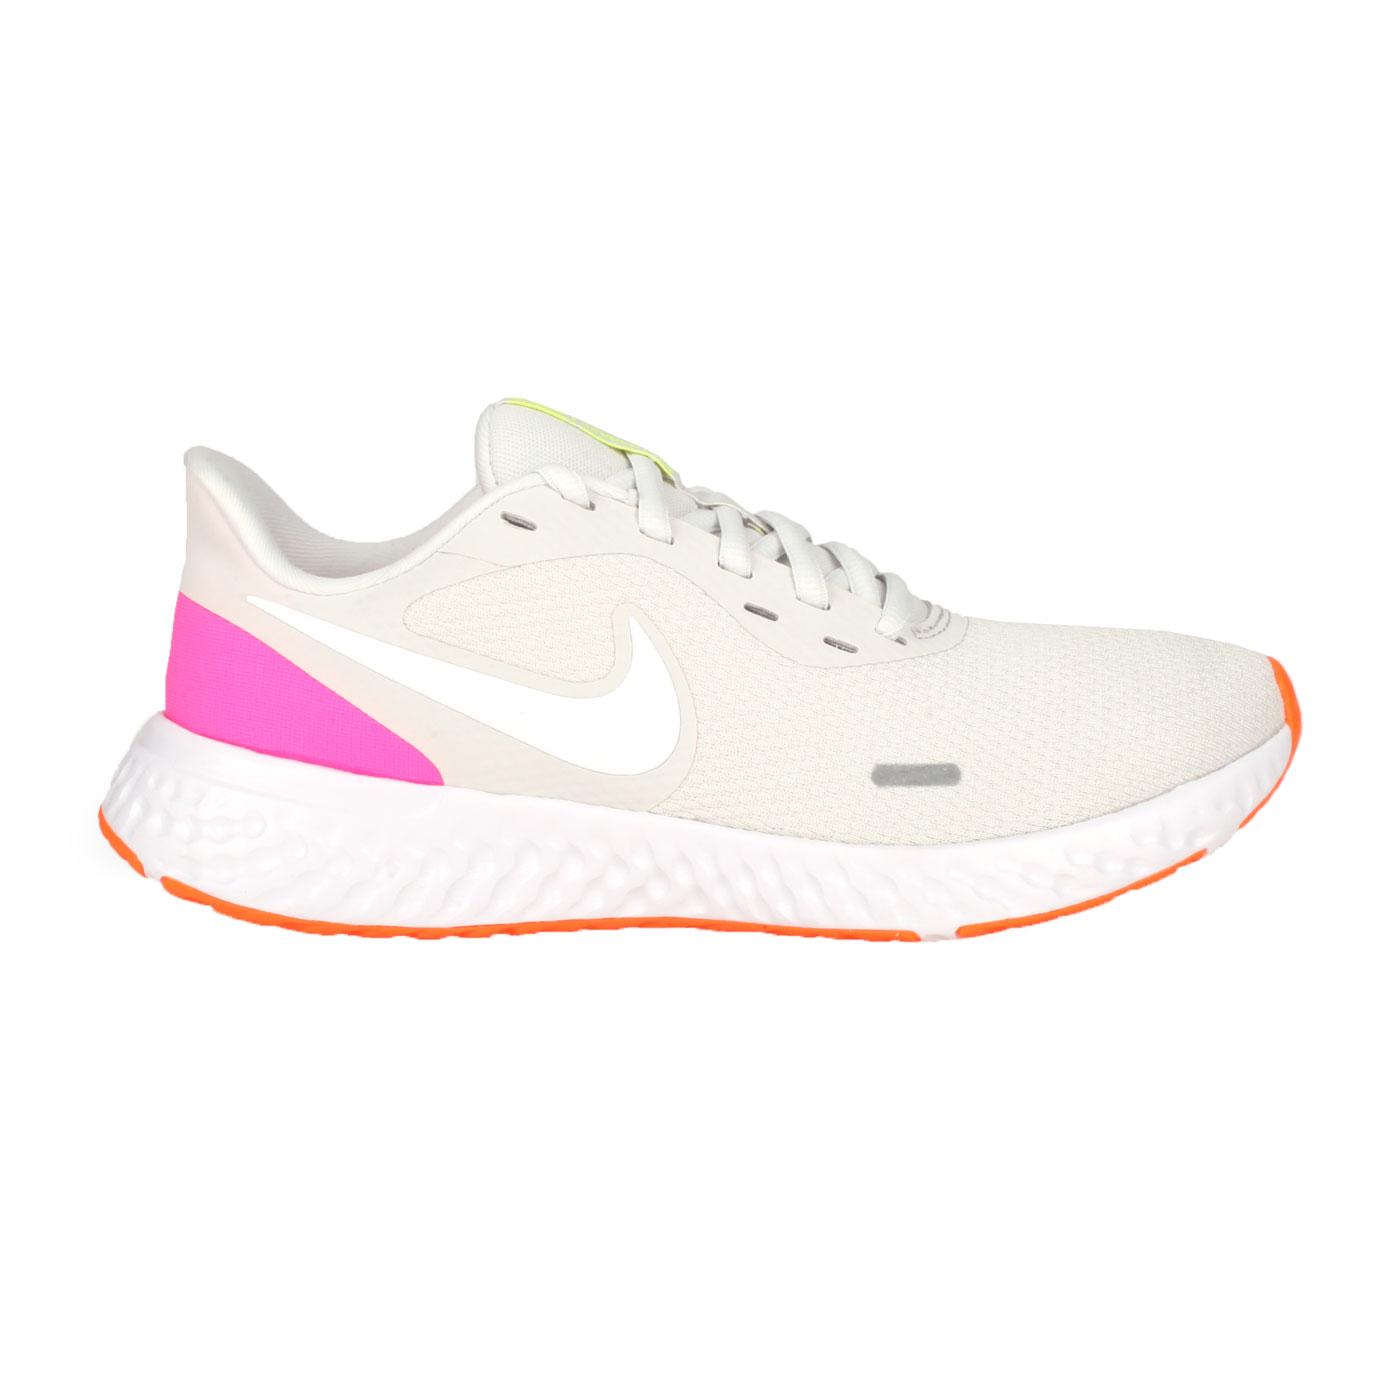 NIKE 女款慢跑鞋  @WMNS REVOLUTION 5@BQ3207002 - 淺灰白亮粉